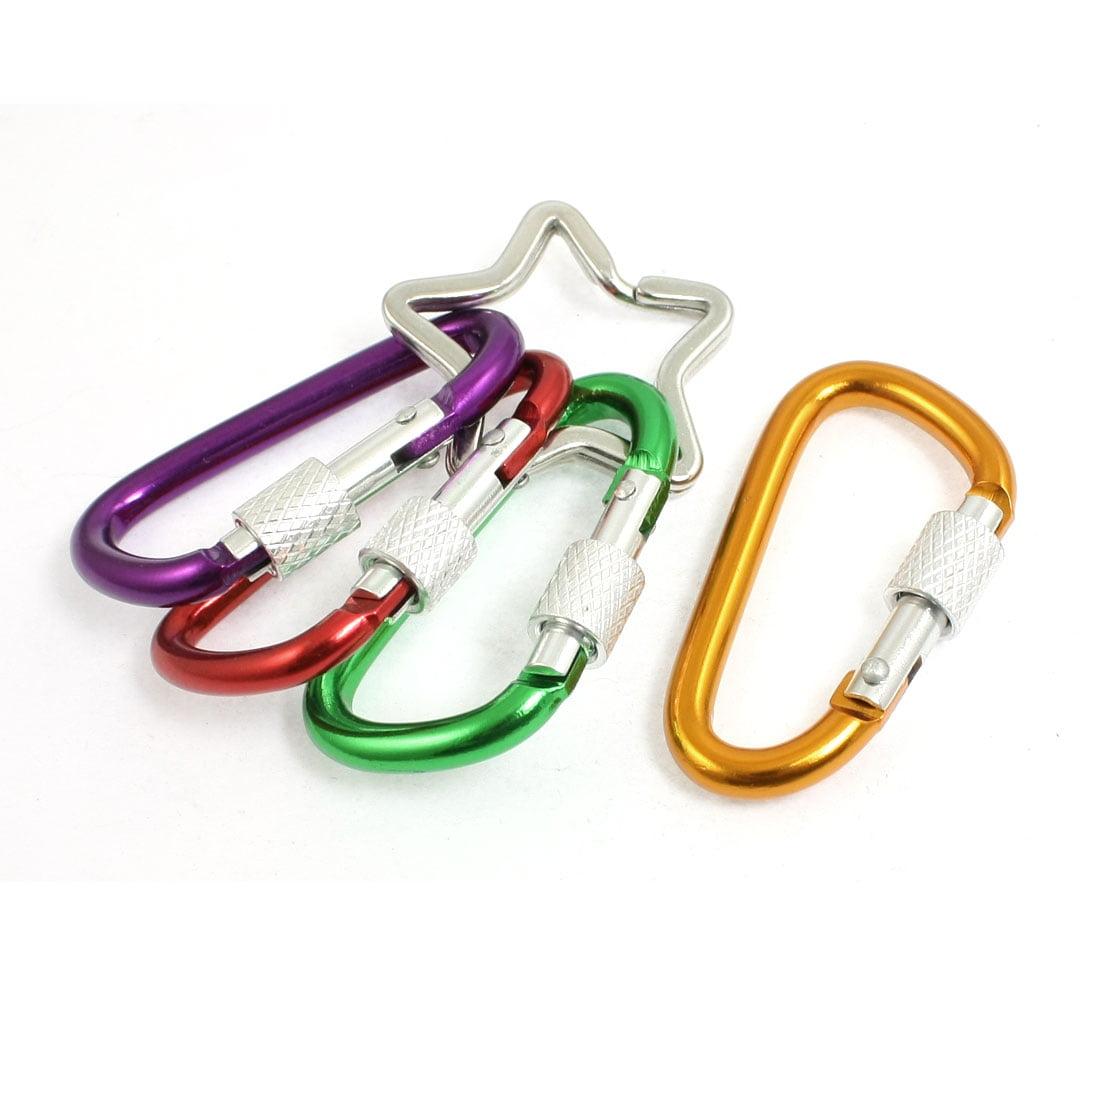 Colorful D Shape Screw On Lock Keychain Carabiner W